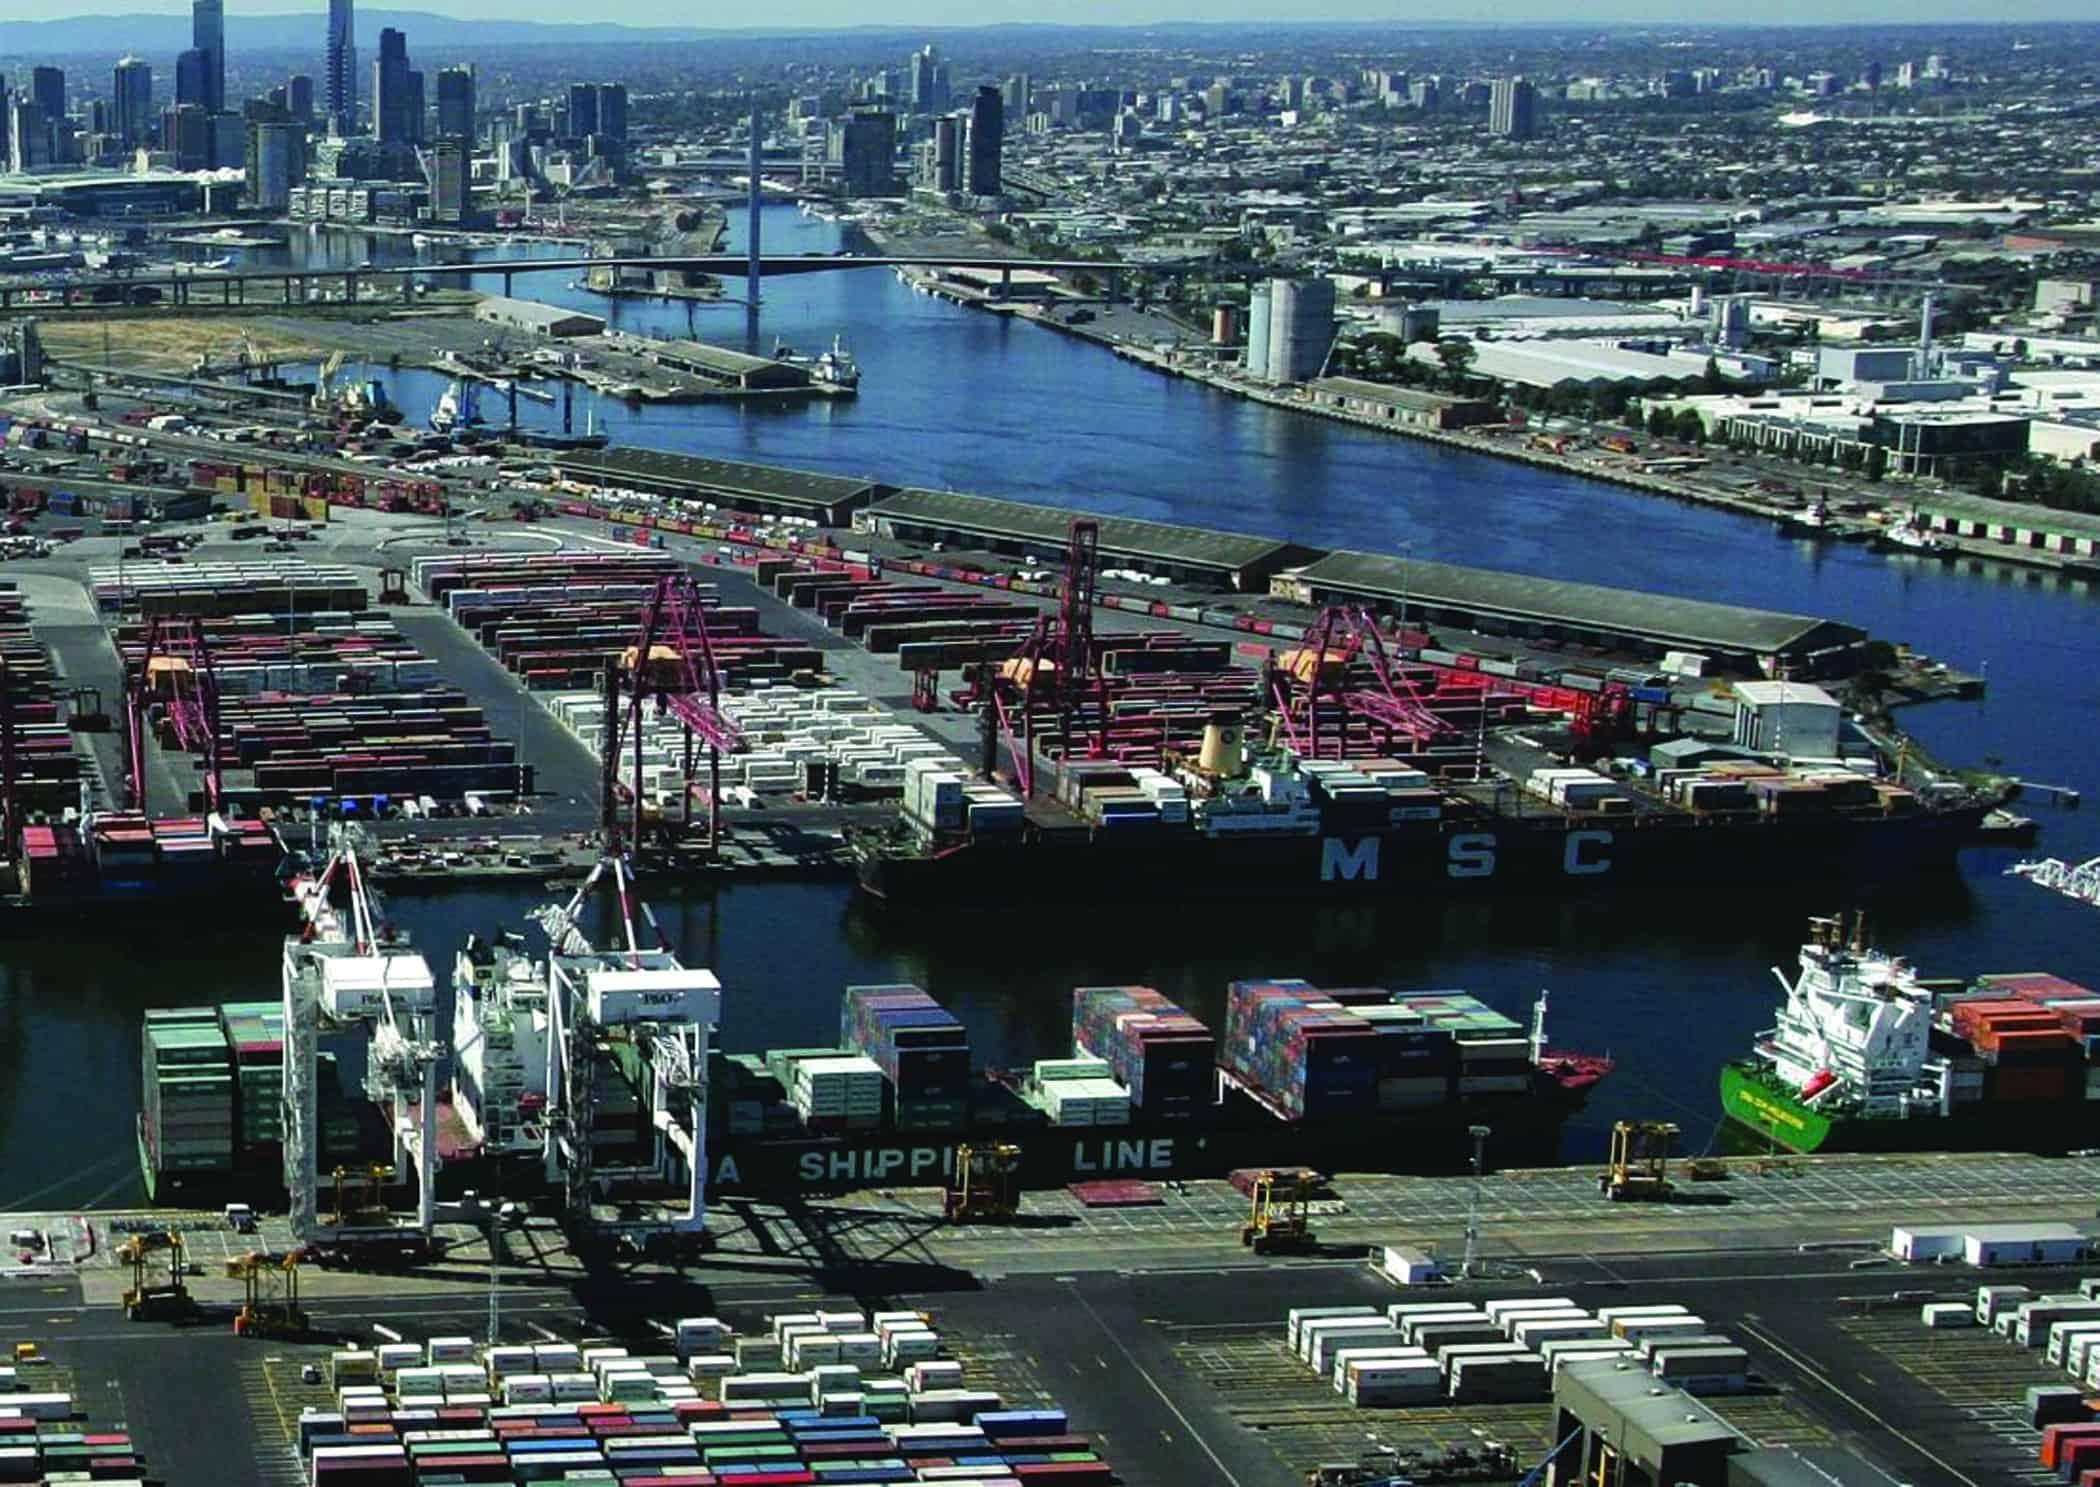 DP World seeks to challenge 750% rent hike at Port of Melbourne